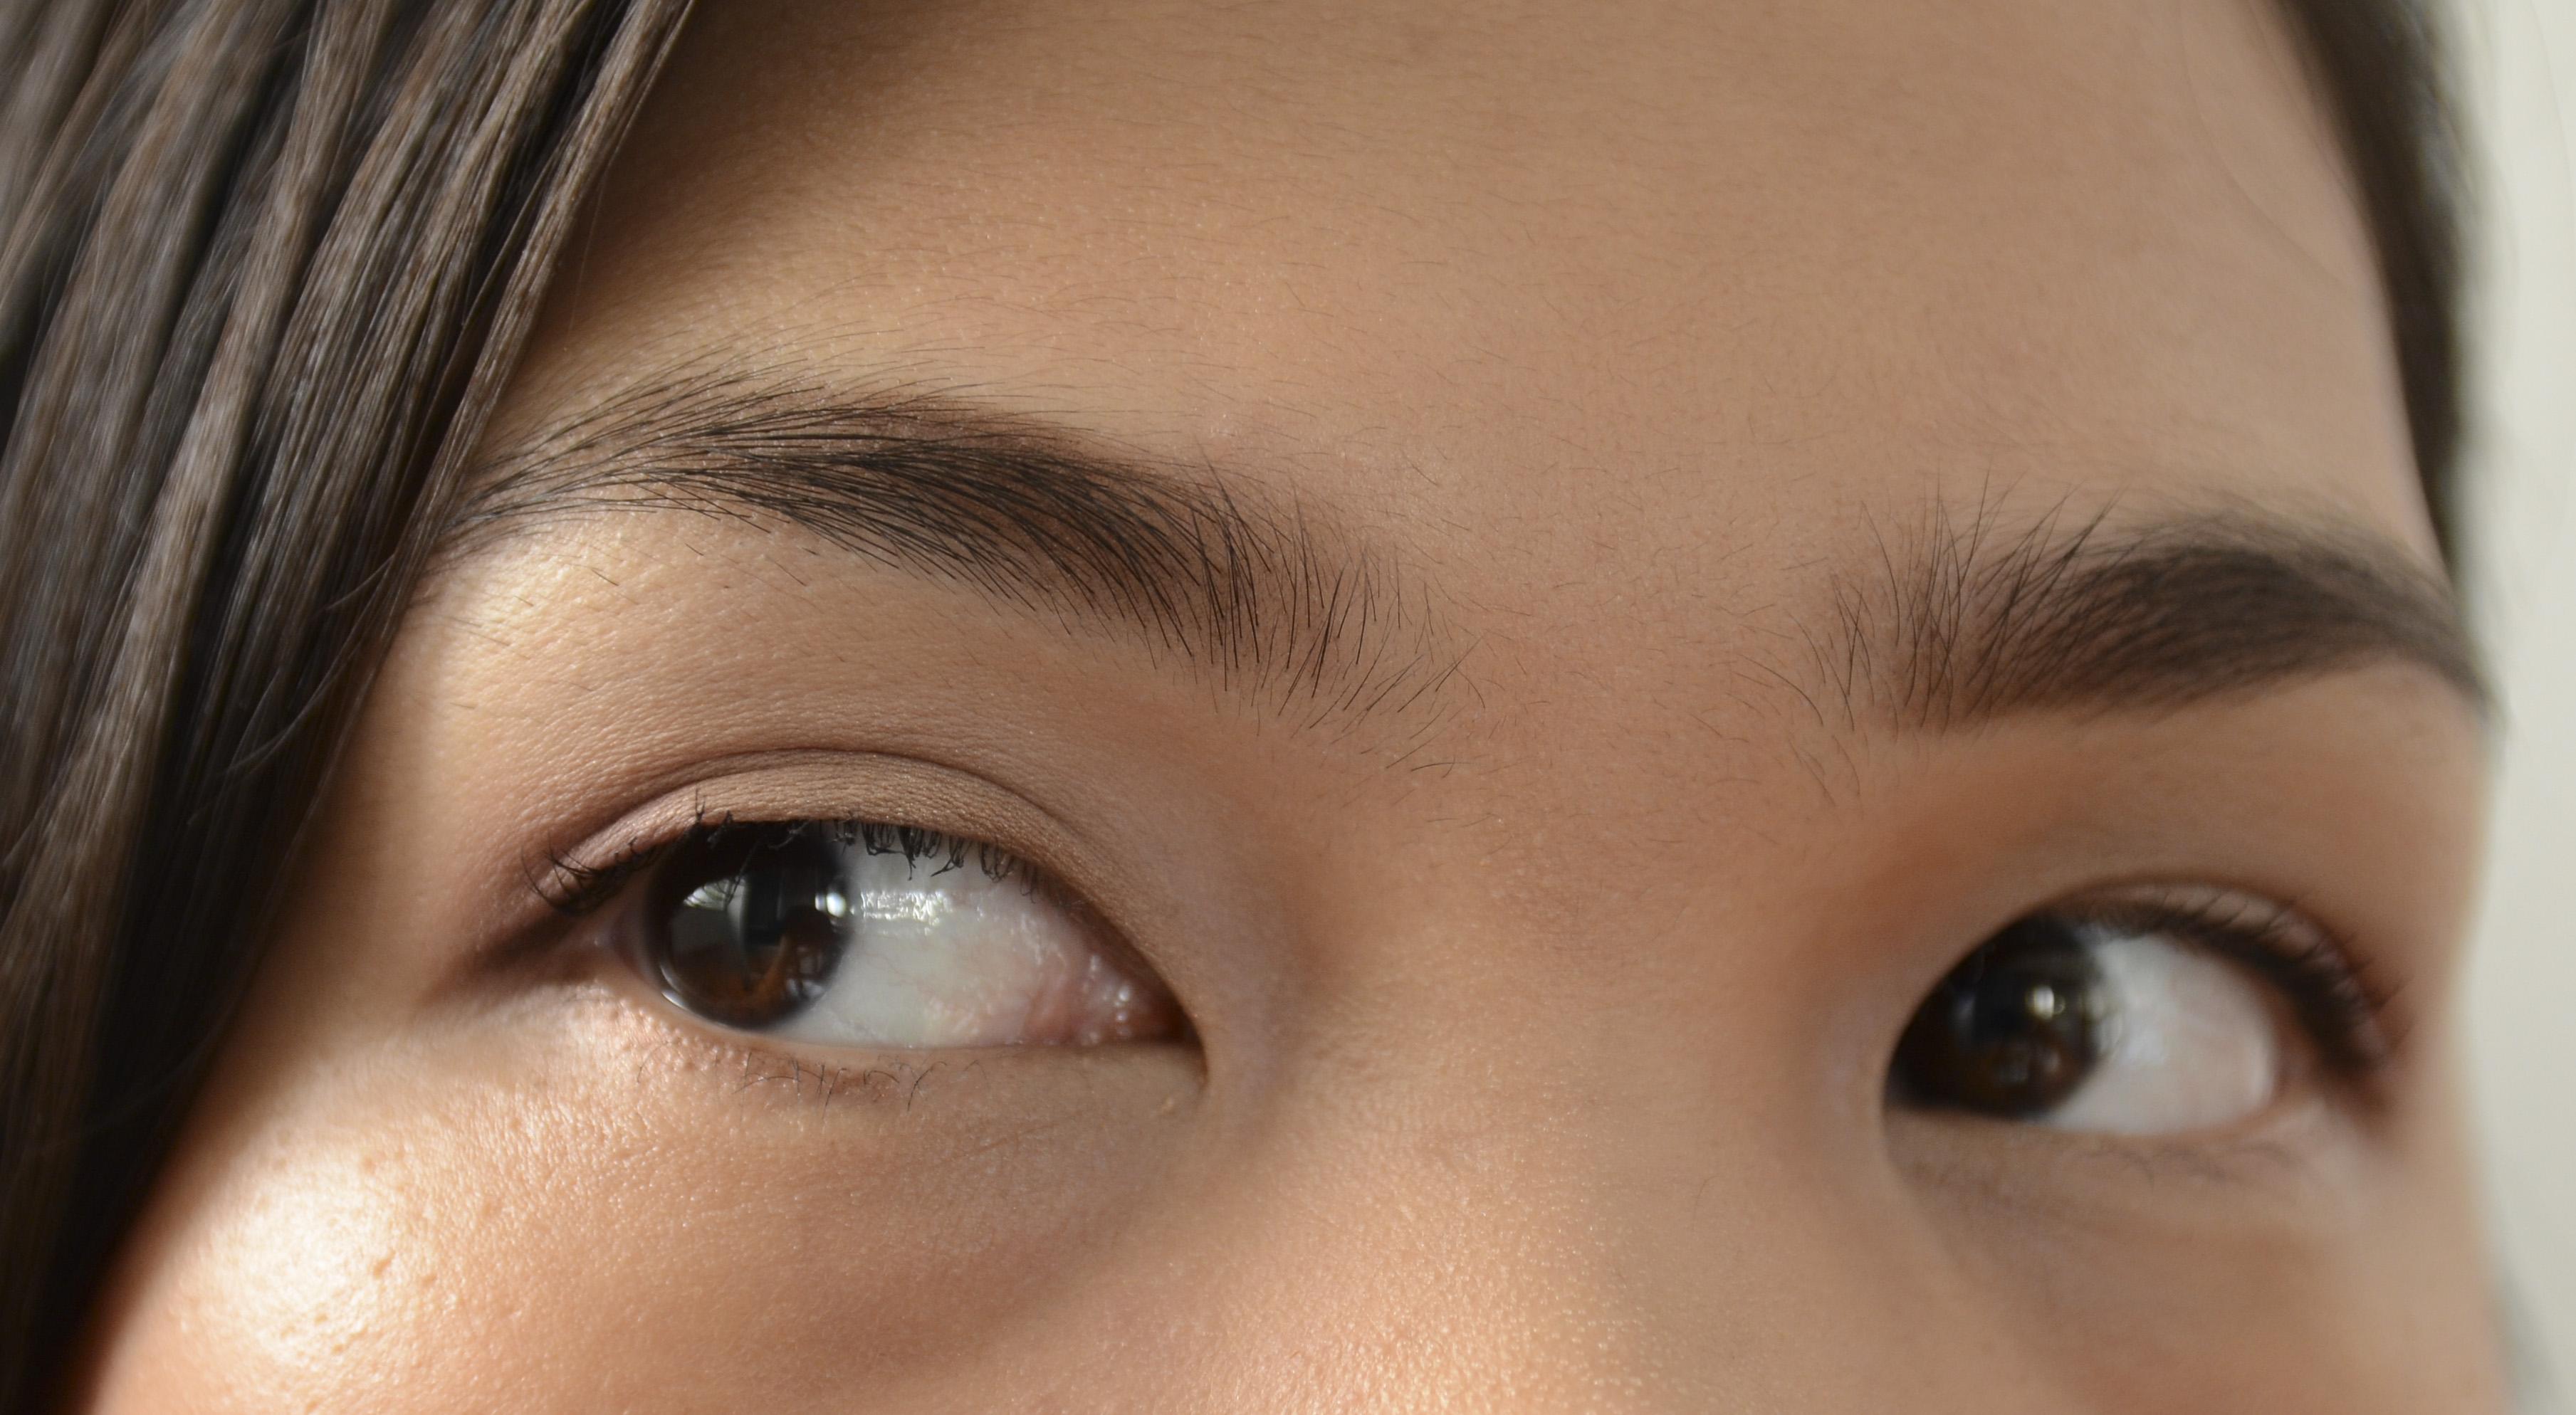 FOTD - 03082016 - Eyes Brows